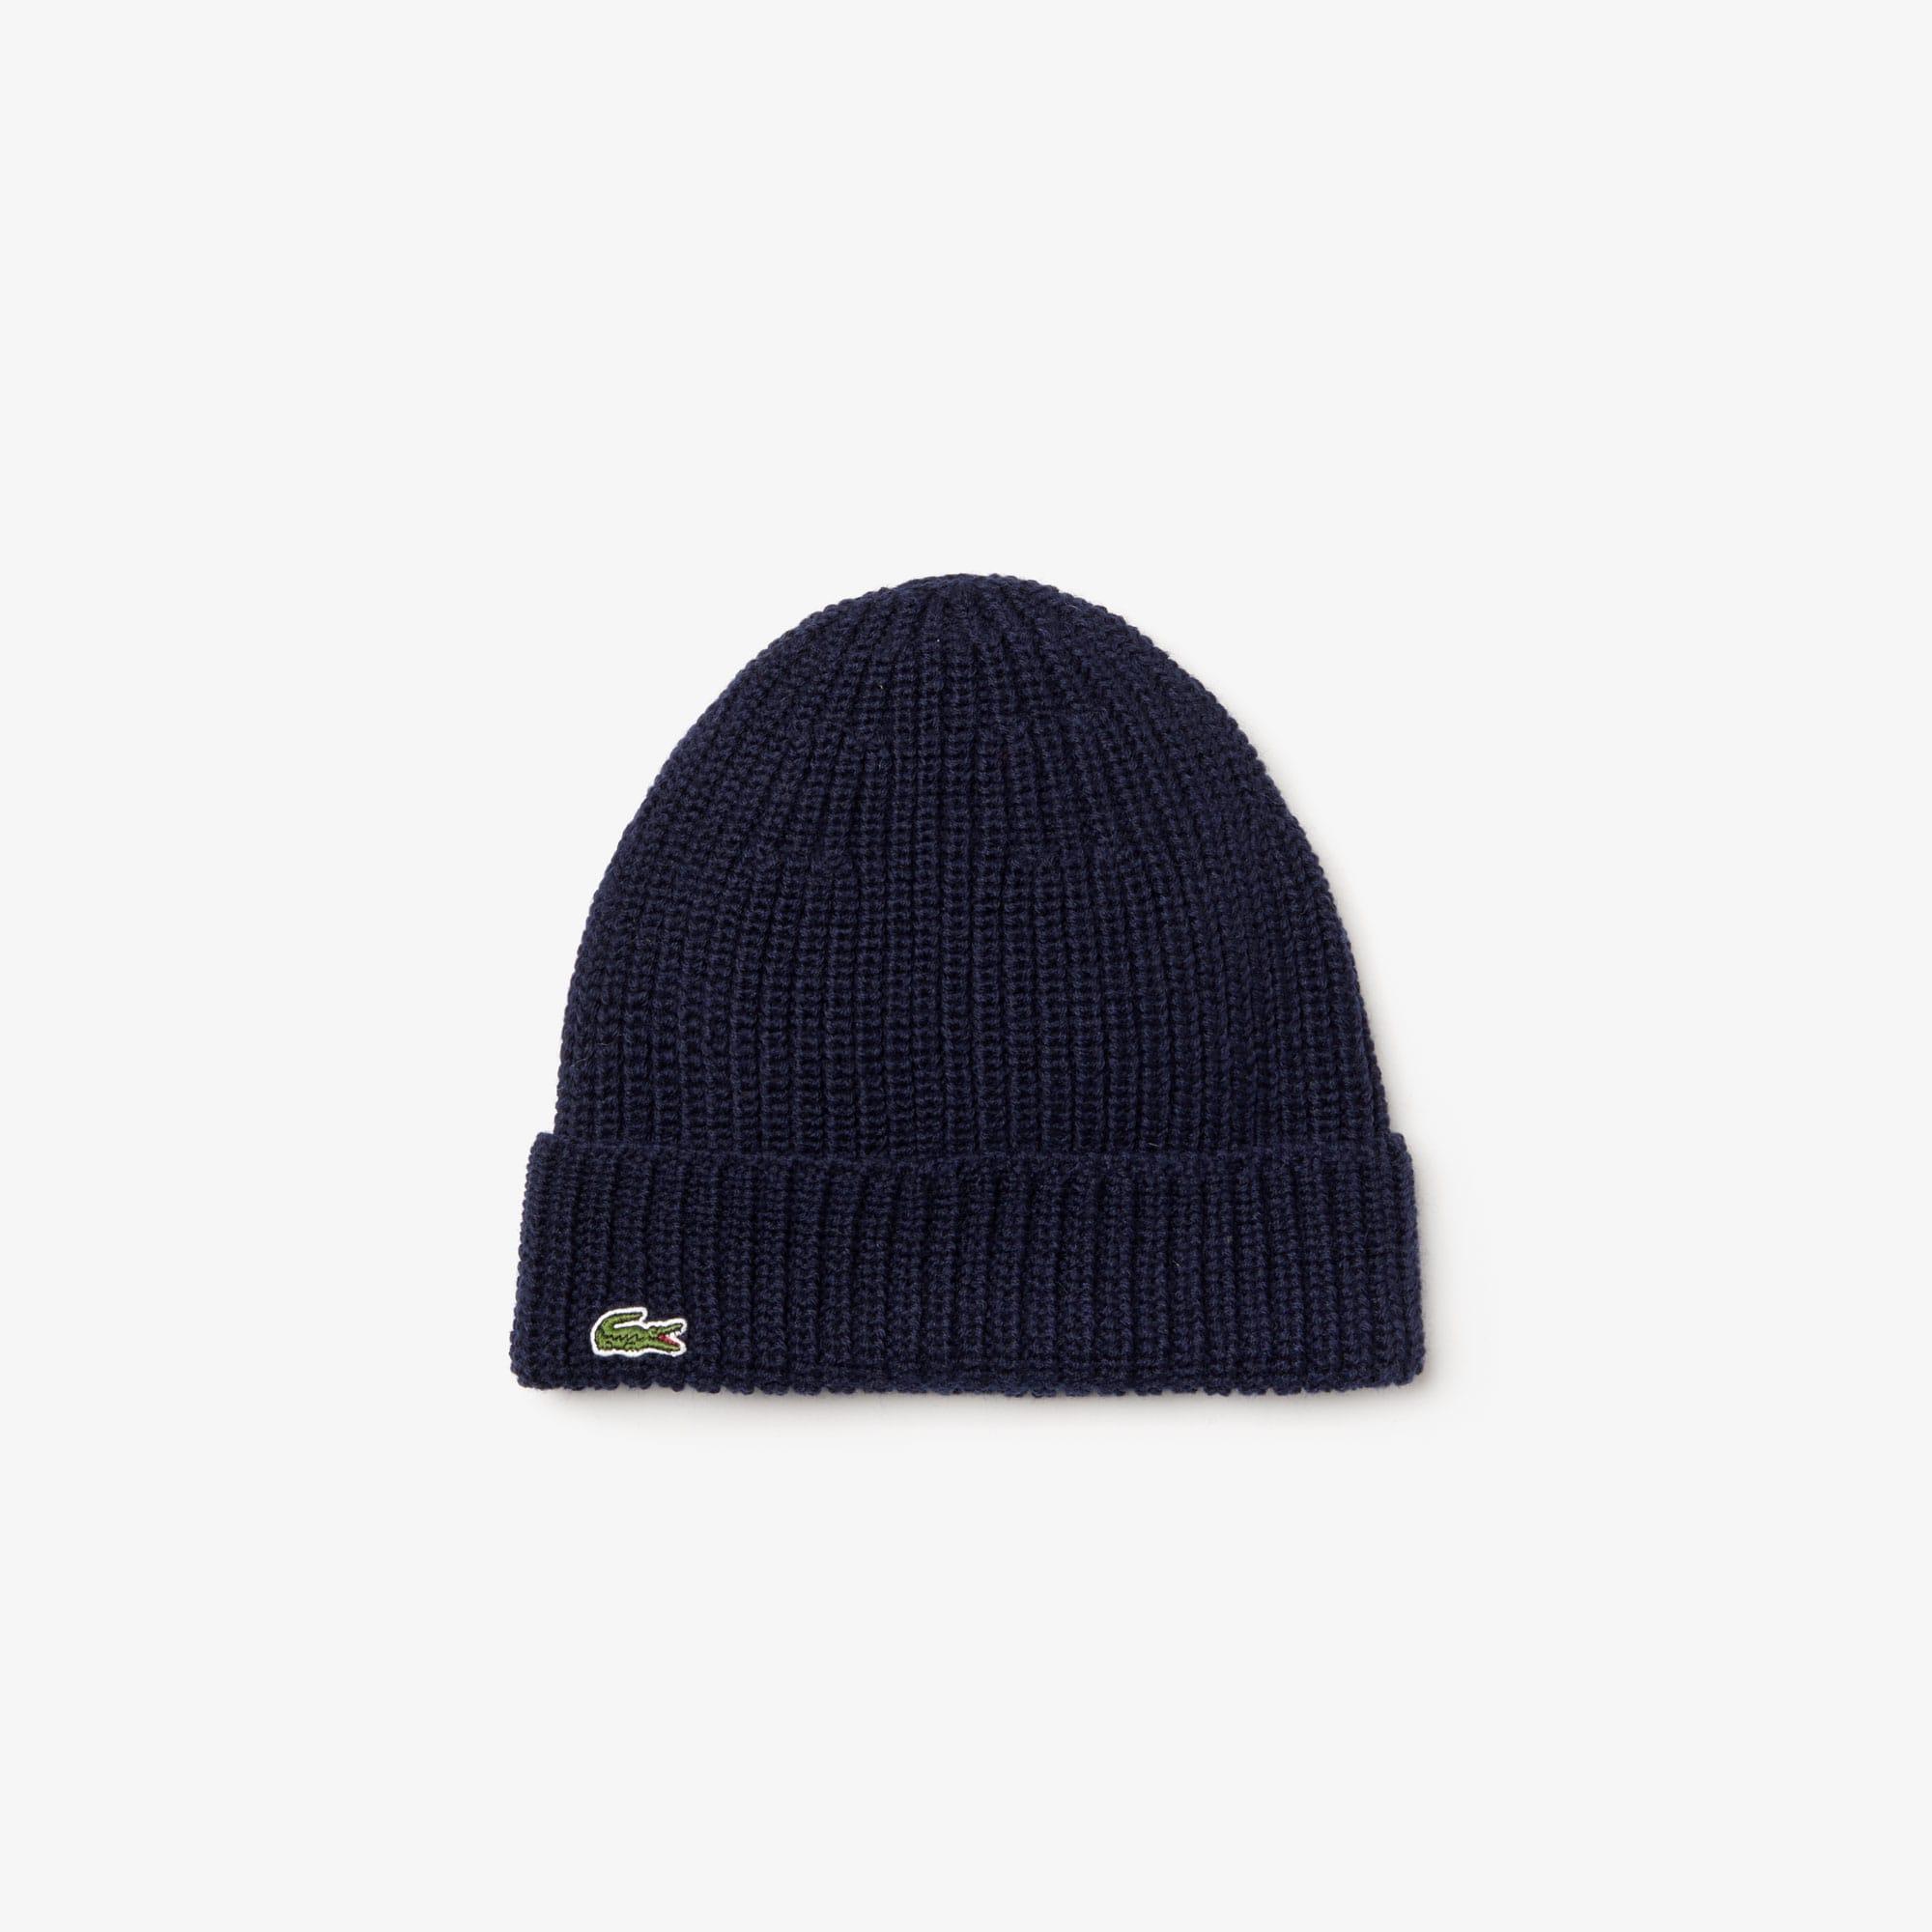 men s caps and hats men s accessories lacoste